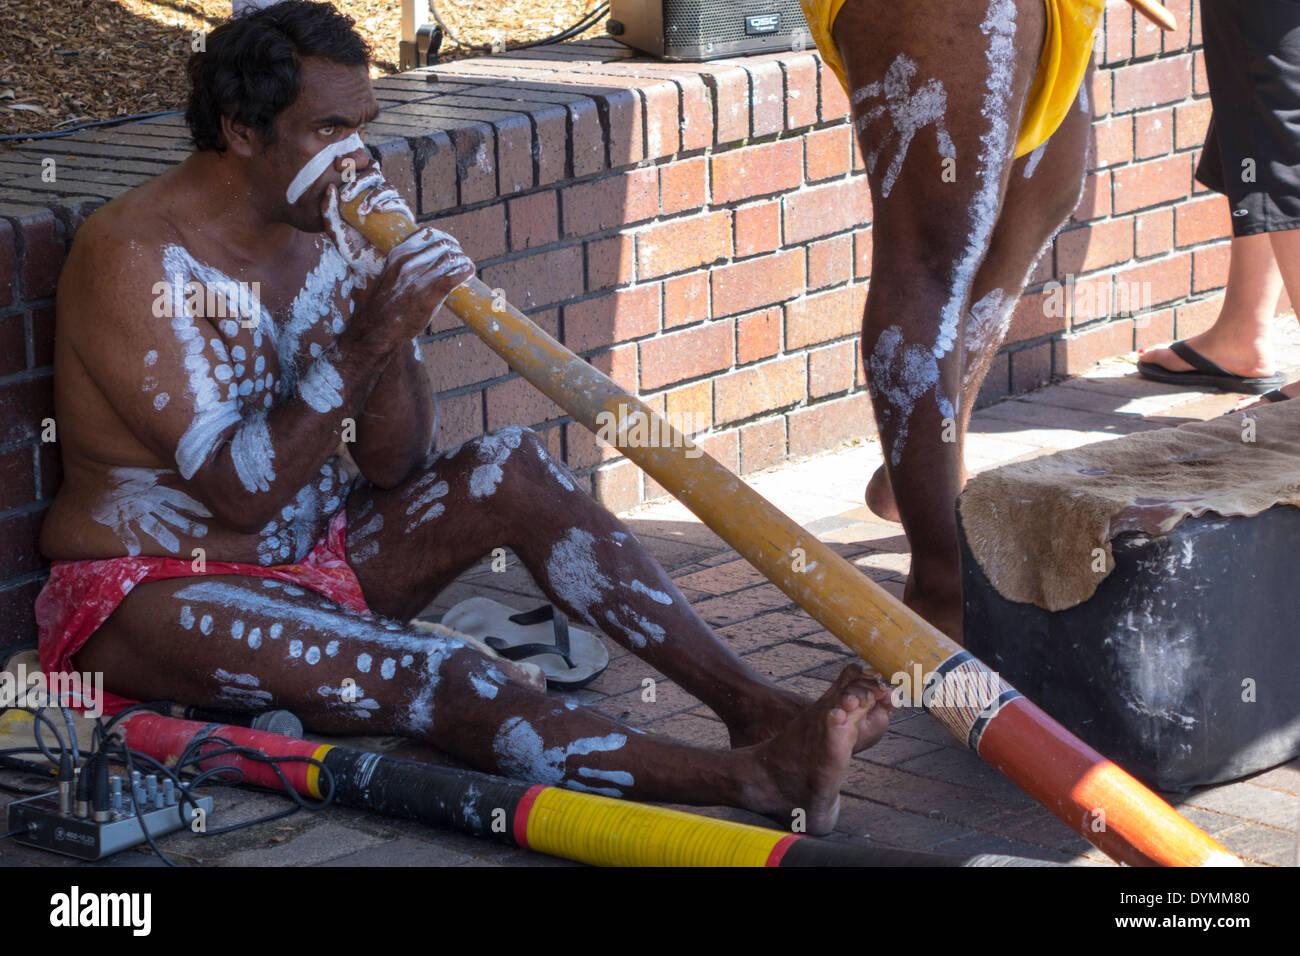 Sydney Australia NSW New South Wales Circular Quay aborigine aboriginal playing didgeridoo body paint - Stock Image